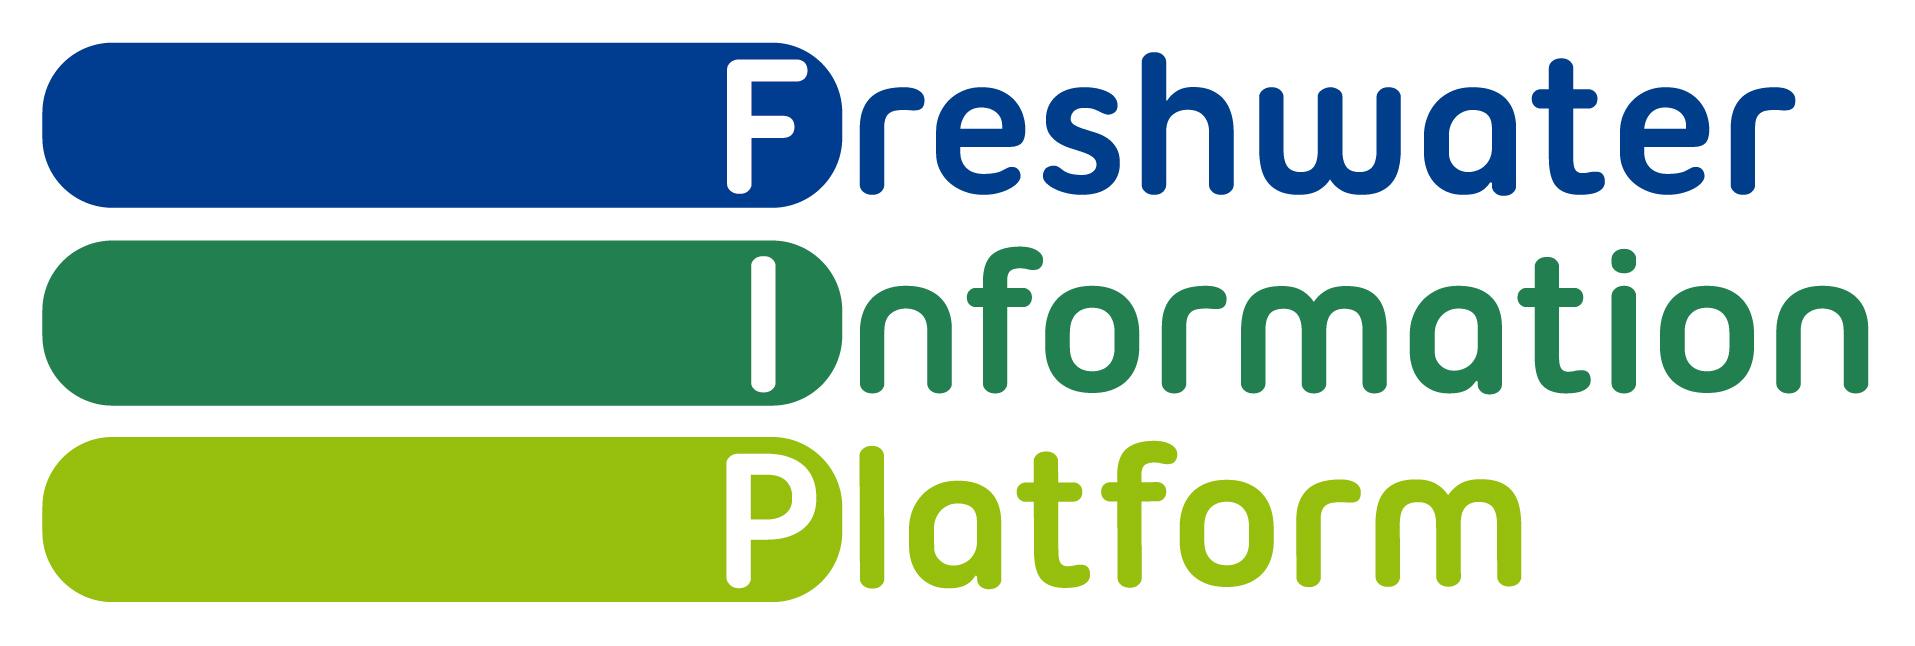 Freshwater Information Platform